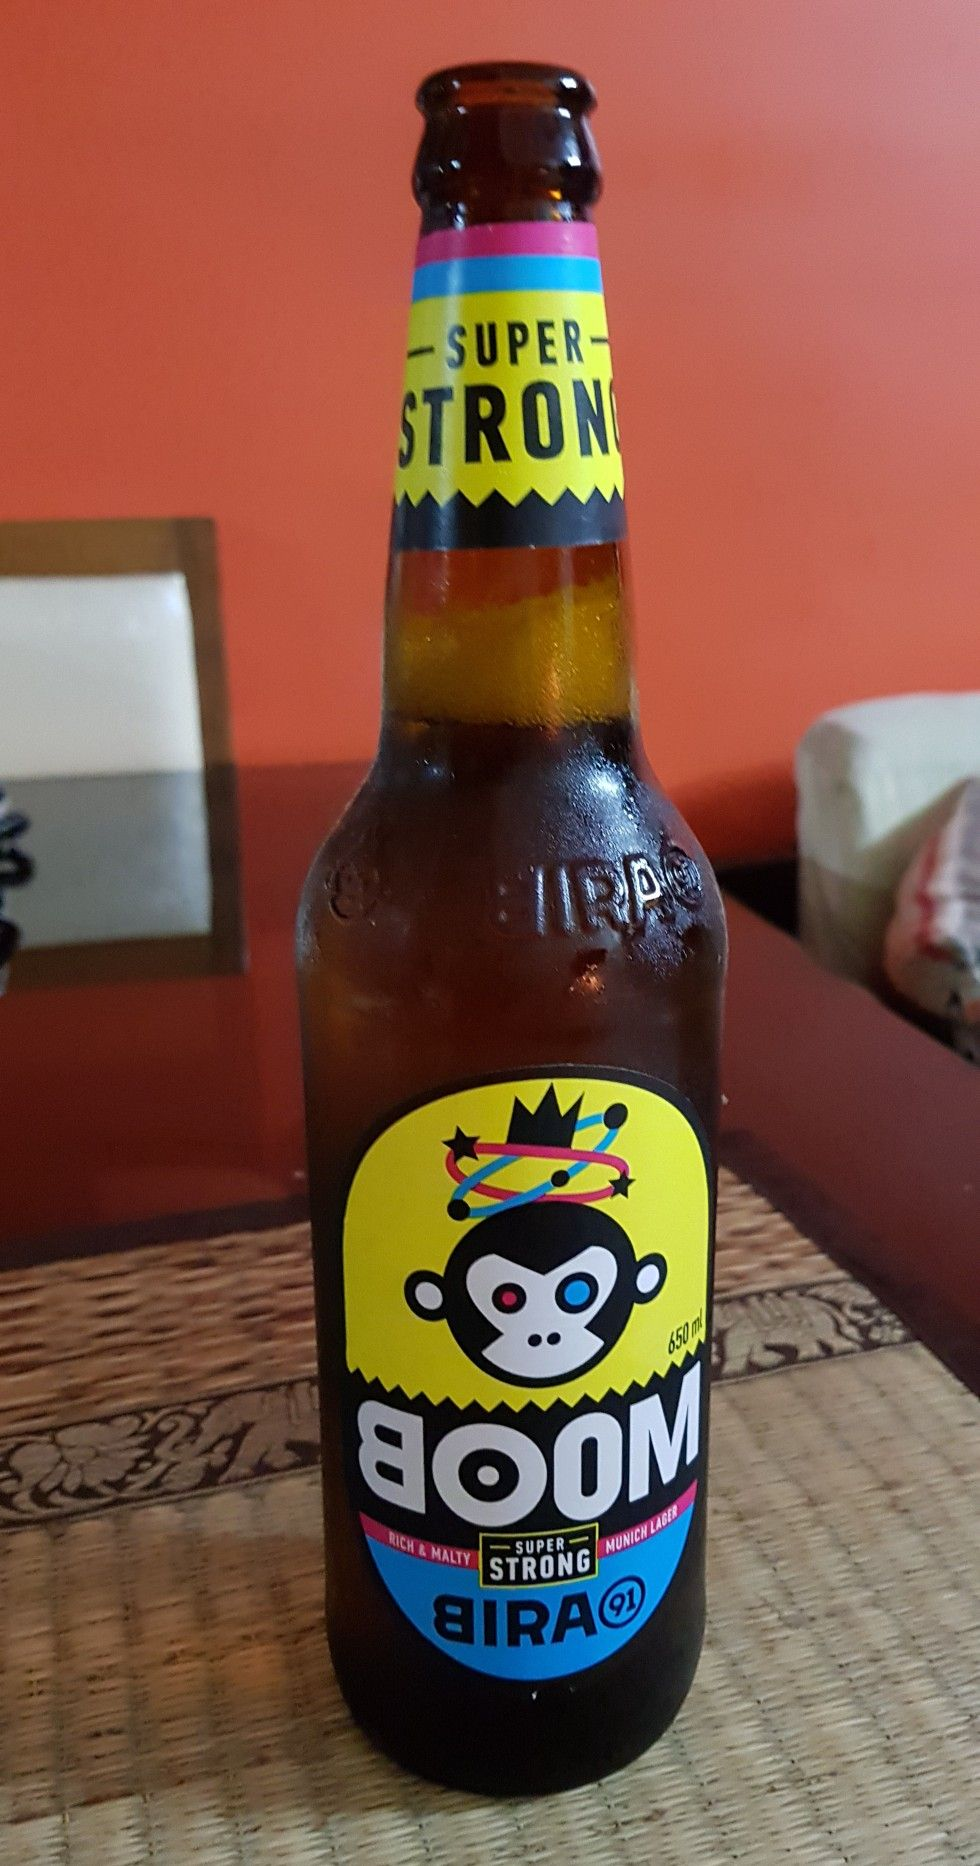 Indian Bira91 Super Strong Beer Rich Malty Munich Lager Beer Lager Beer Bottle